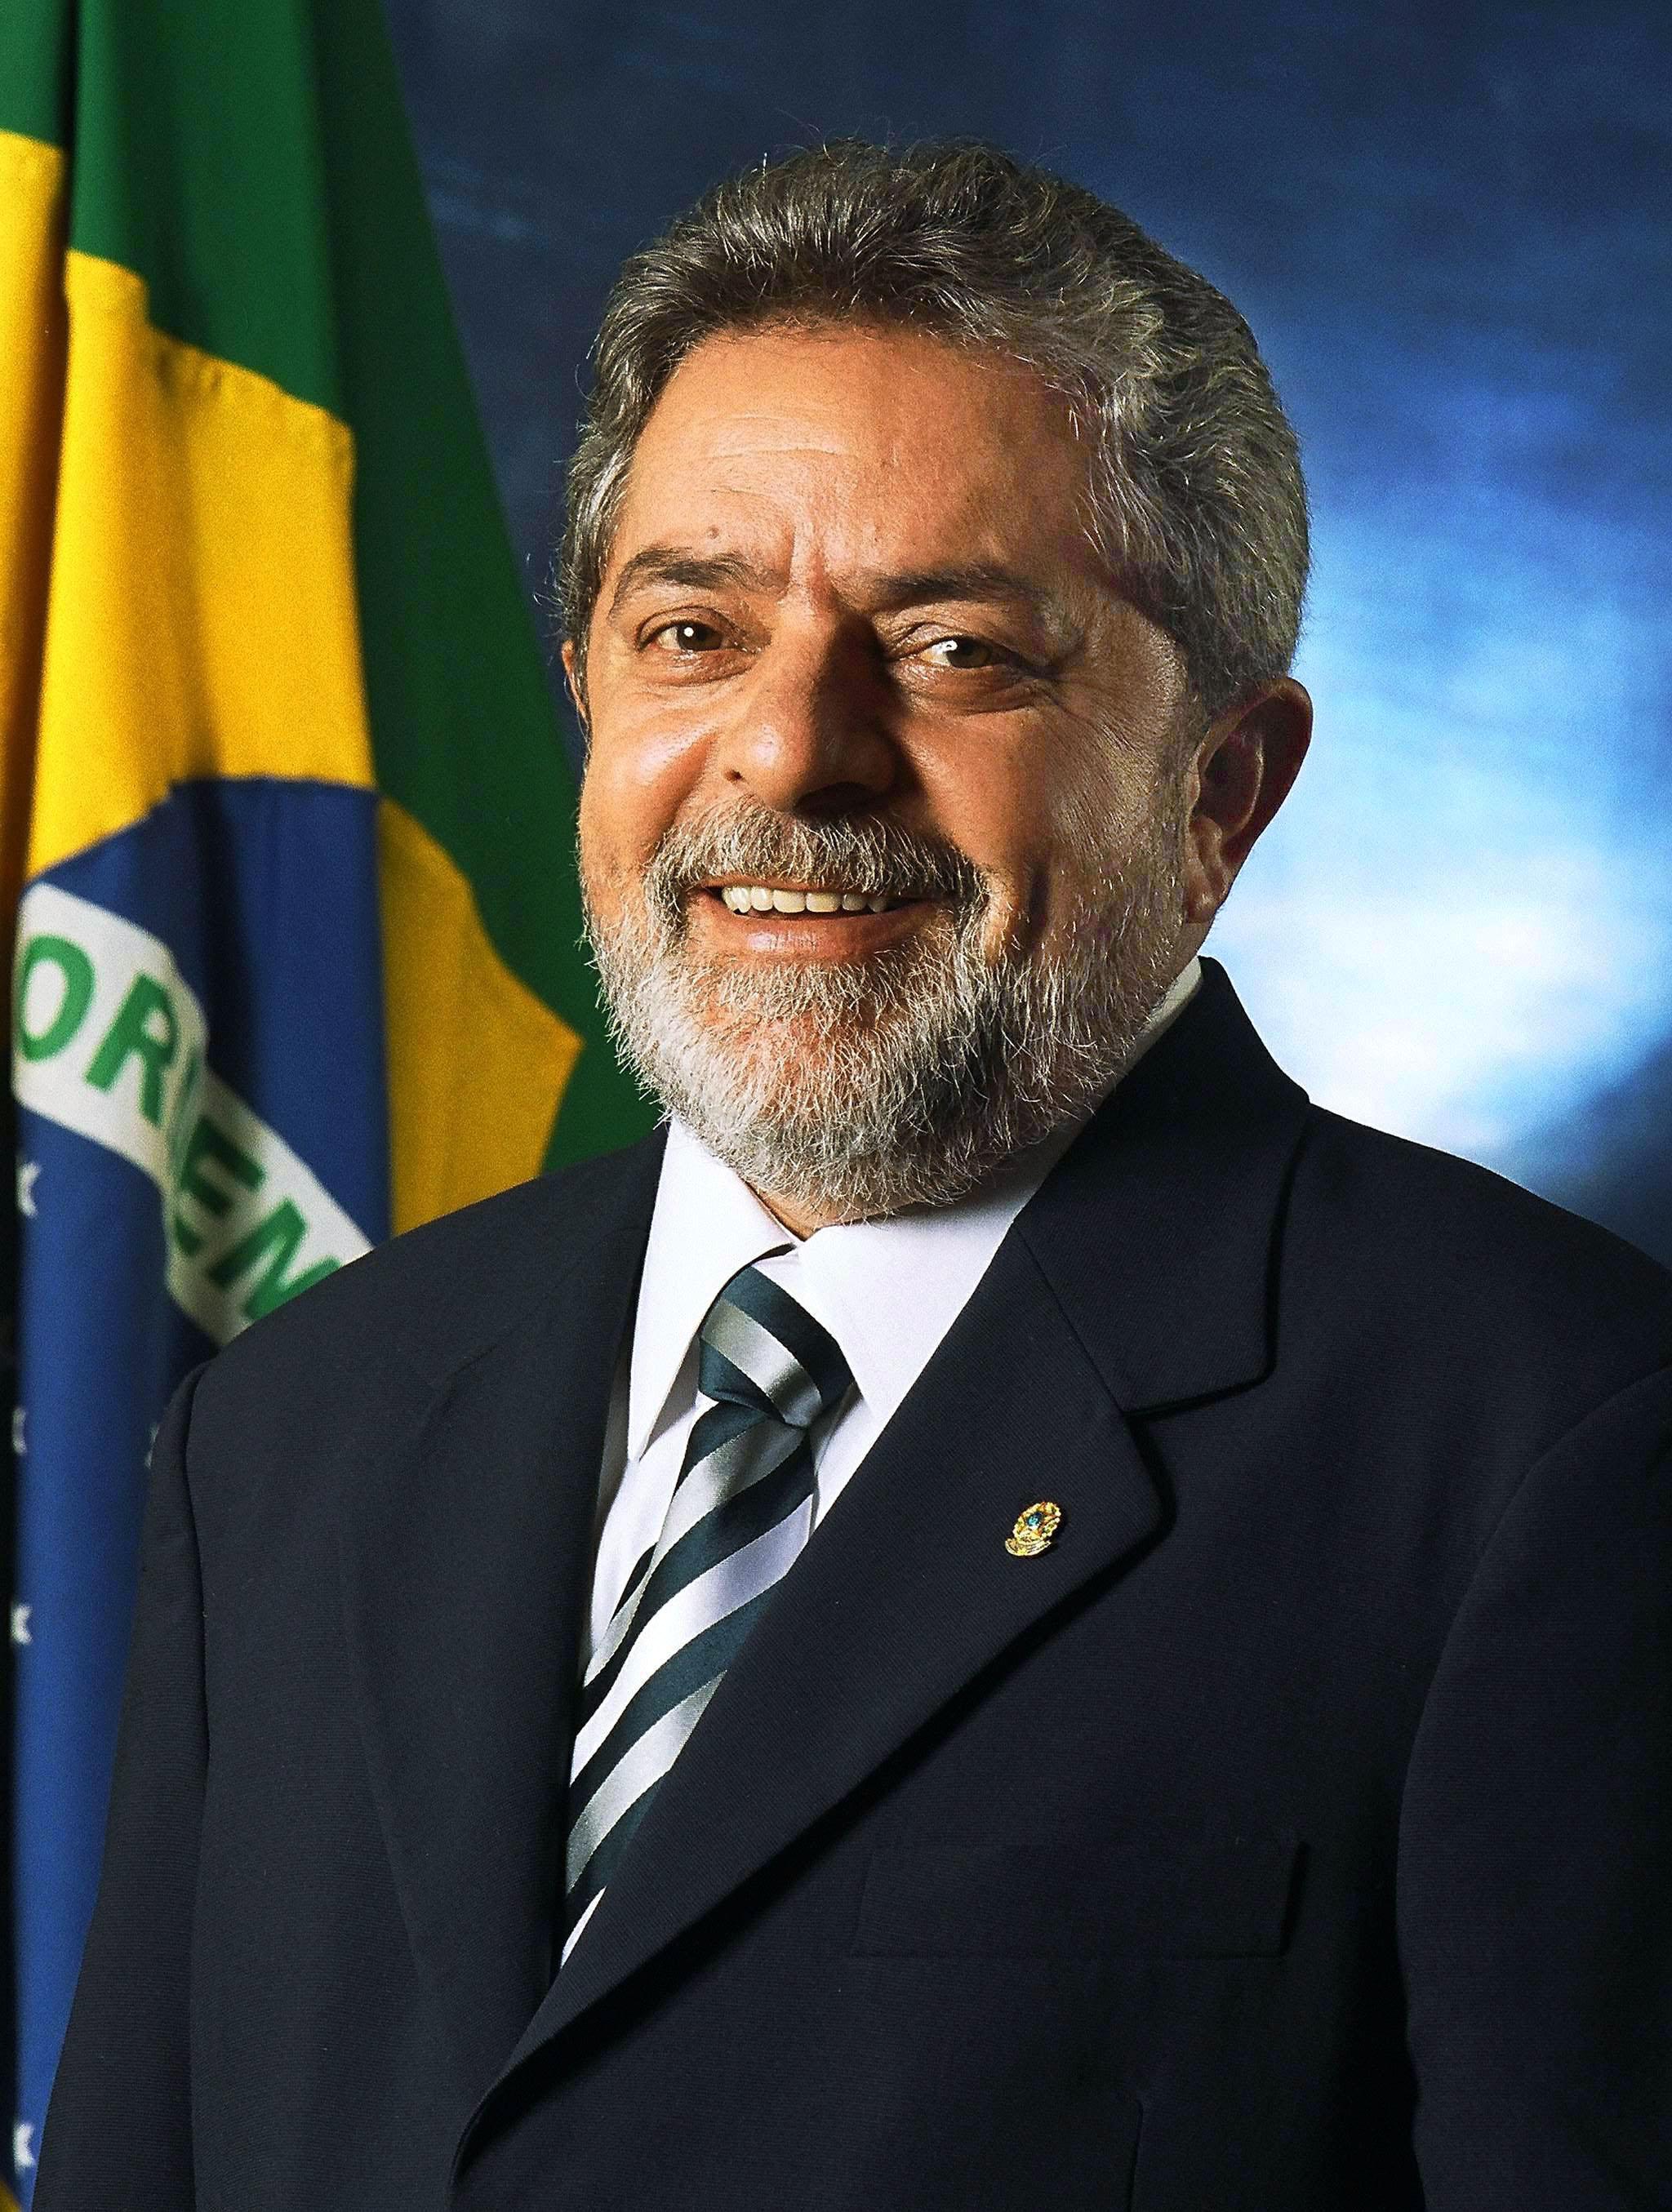 Luiz Inácio da Silva Lula